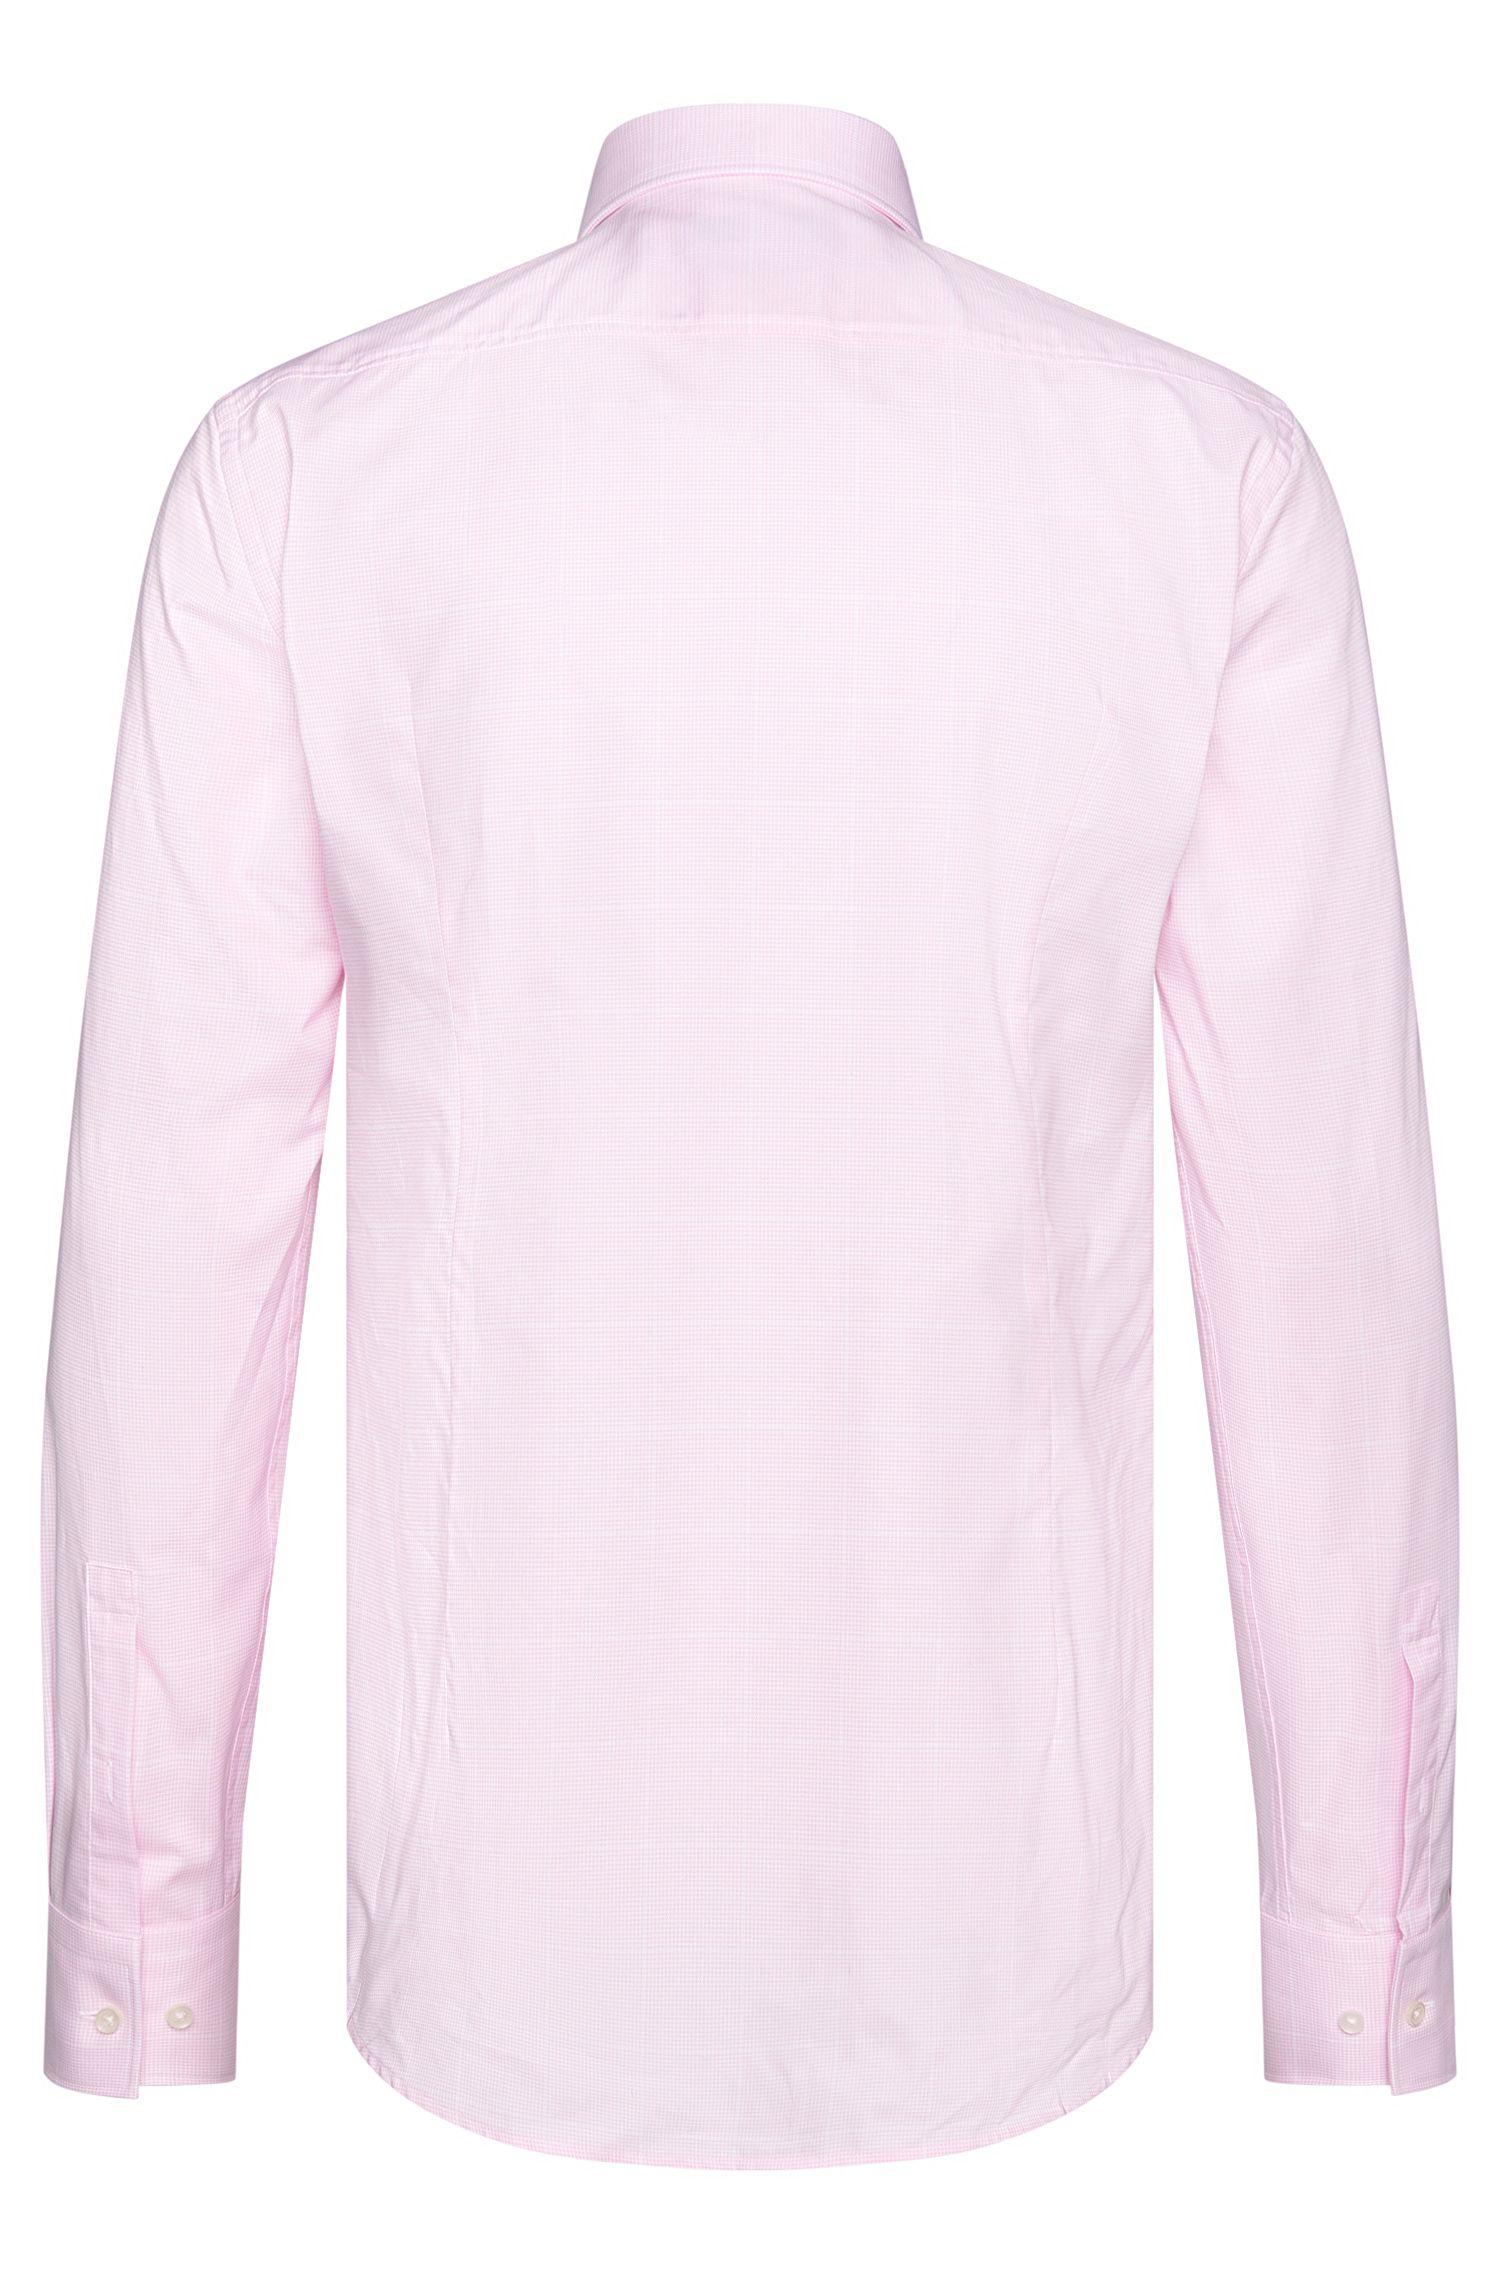 Houndstooth Cotton Dress Shirt, Slim Fit| Jason